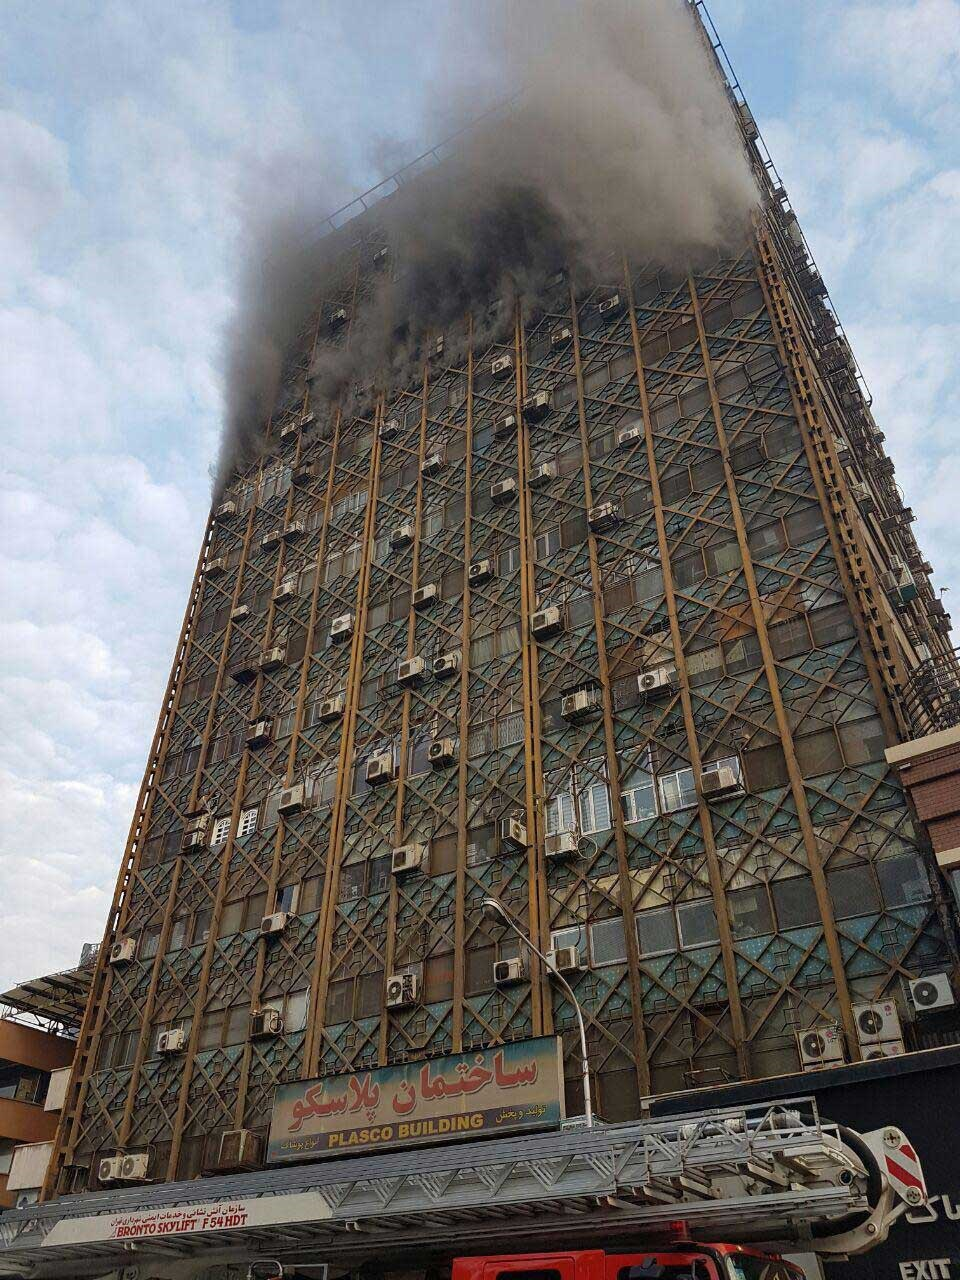 17 1 19 85028photo 2017 01 19 08 50 39 - تصاویر | آتشسوزی گسترده در ساختمان پلاسکو در تهران